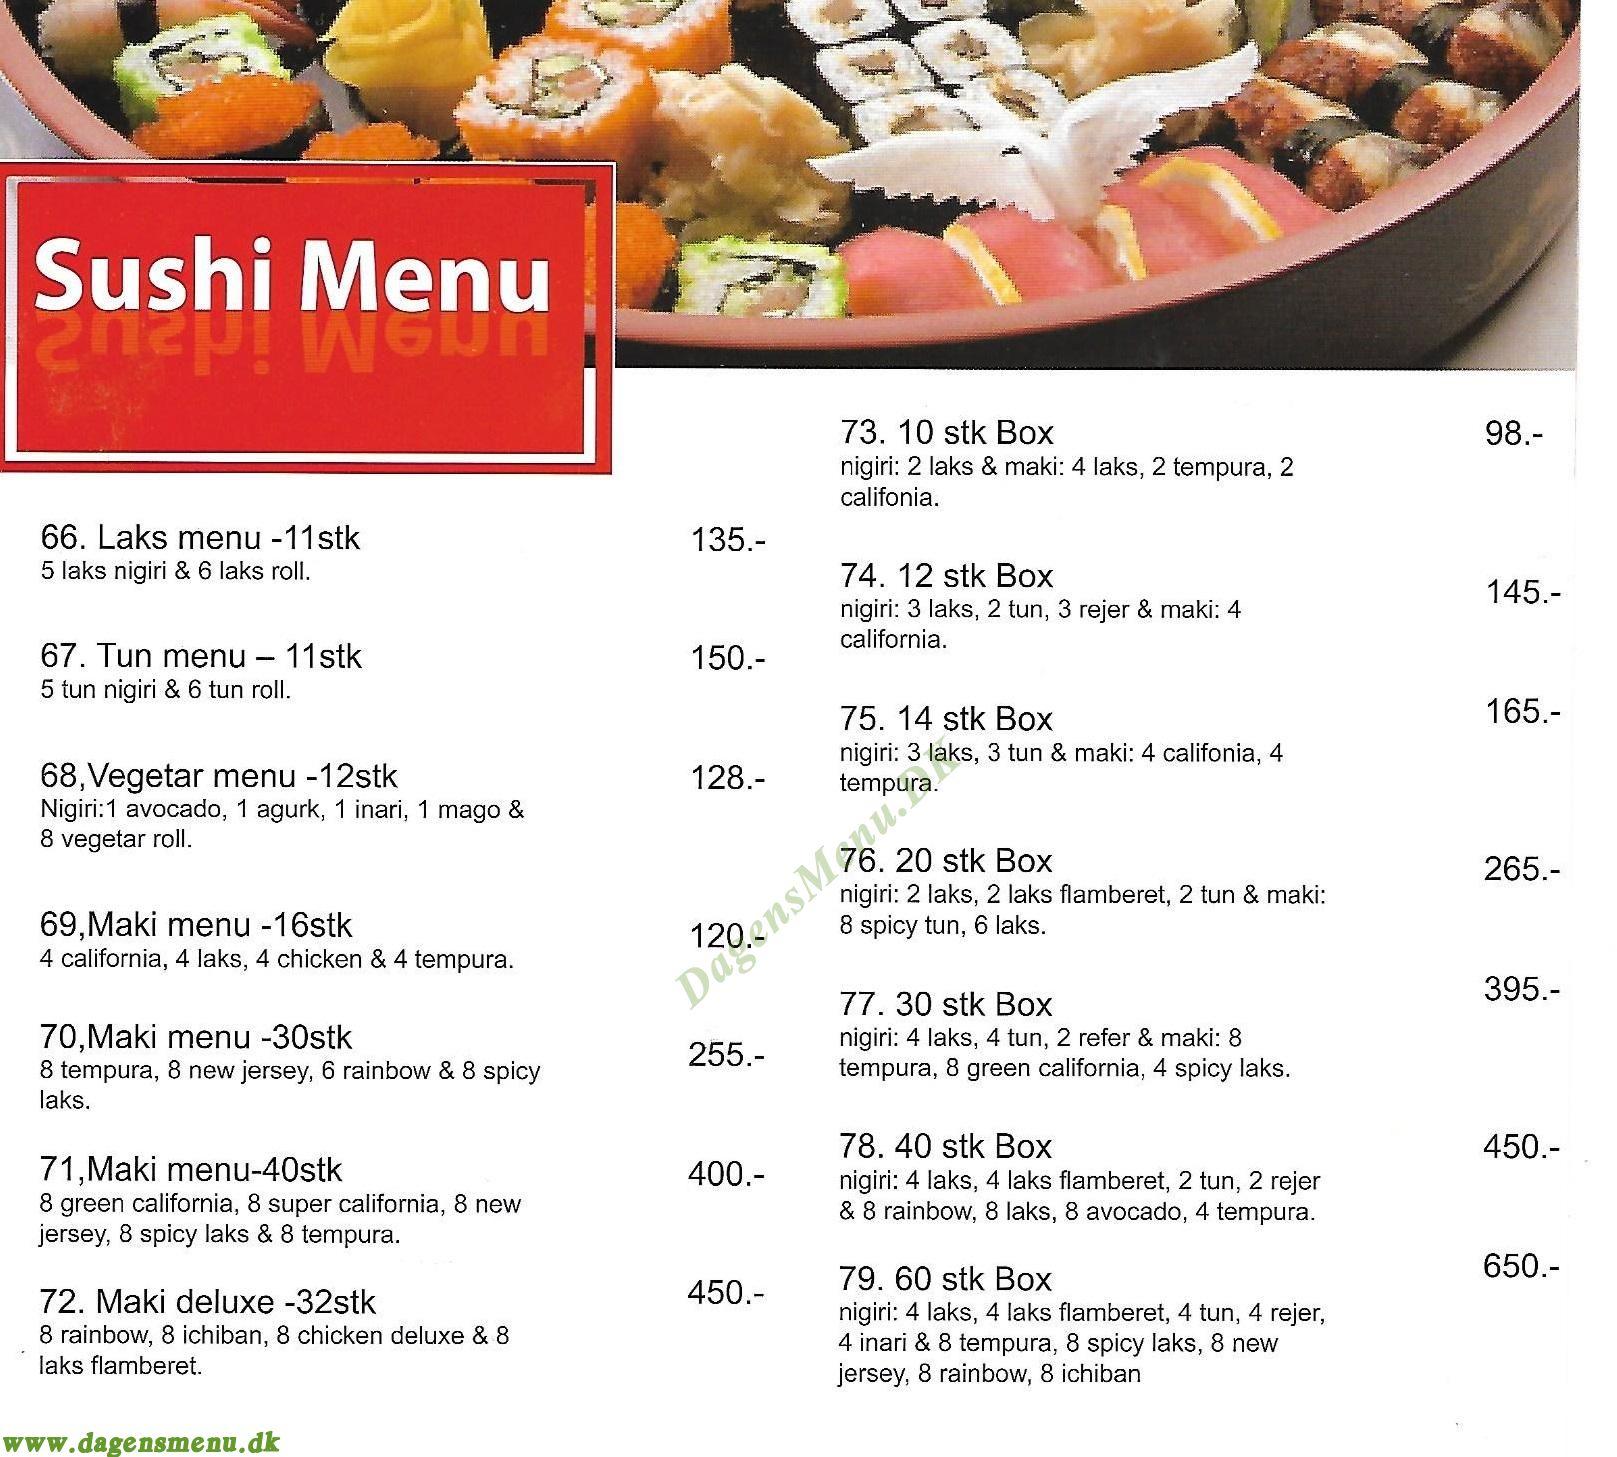 Nyu Sakura Running Sushi Menukort